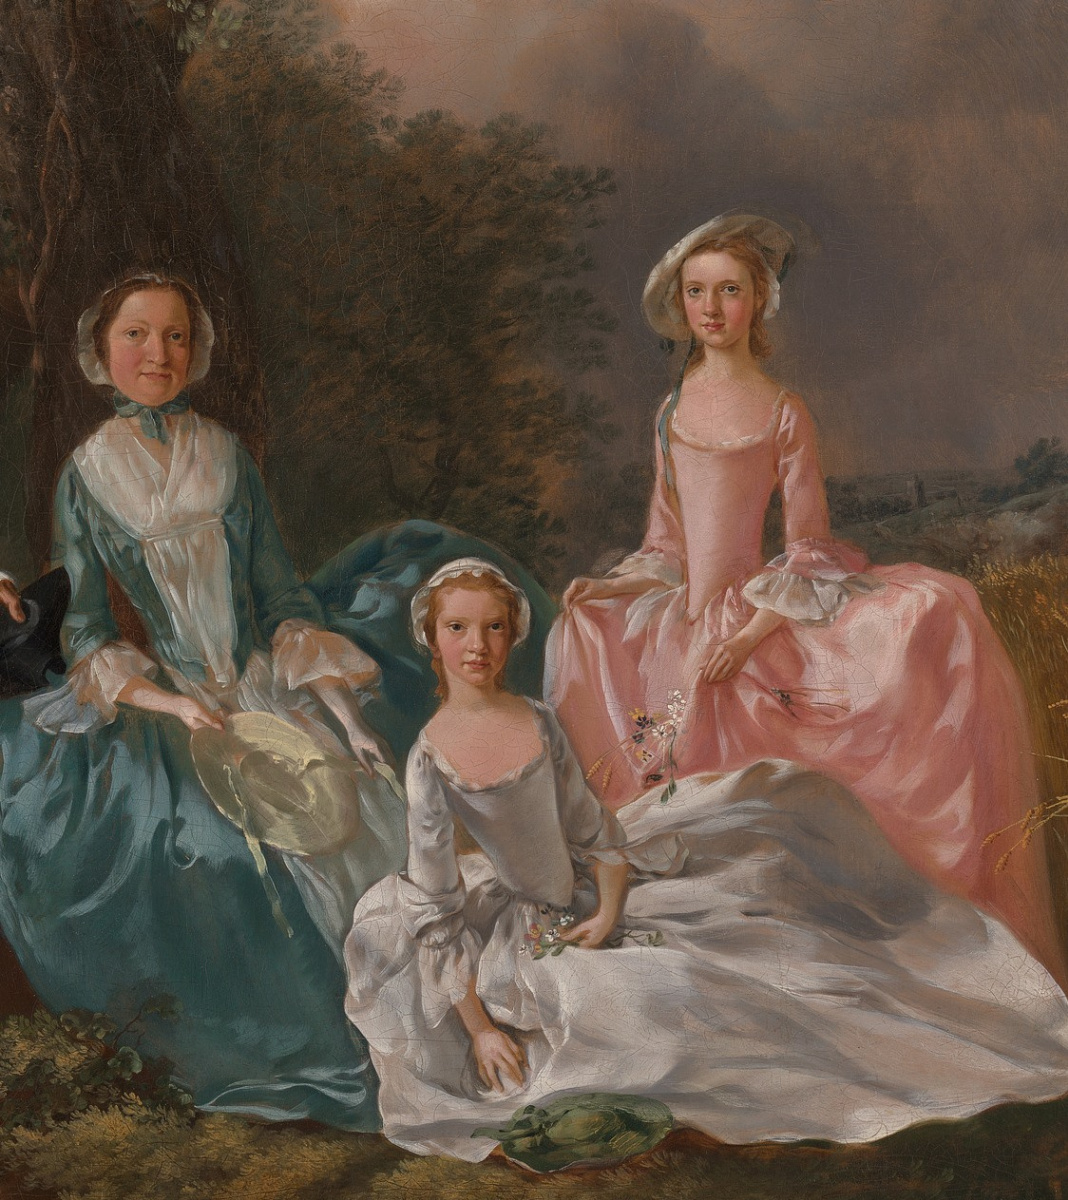 Thomas Gainsborough. Portrait of the family Gravenor. Fragment